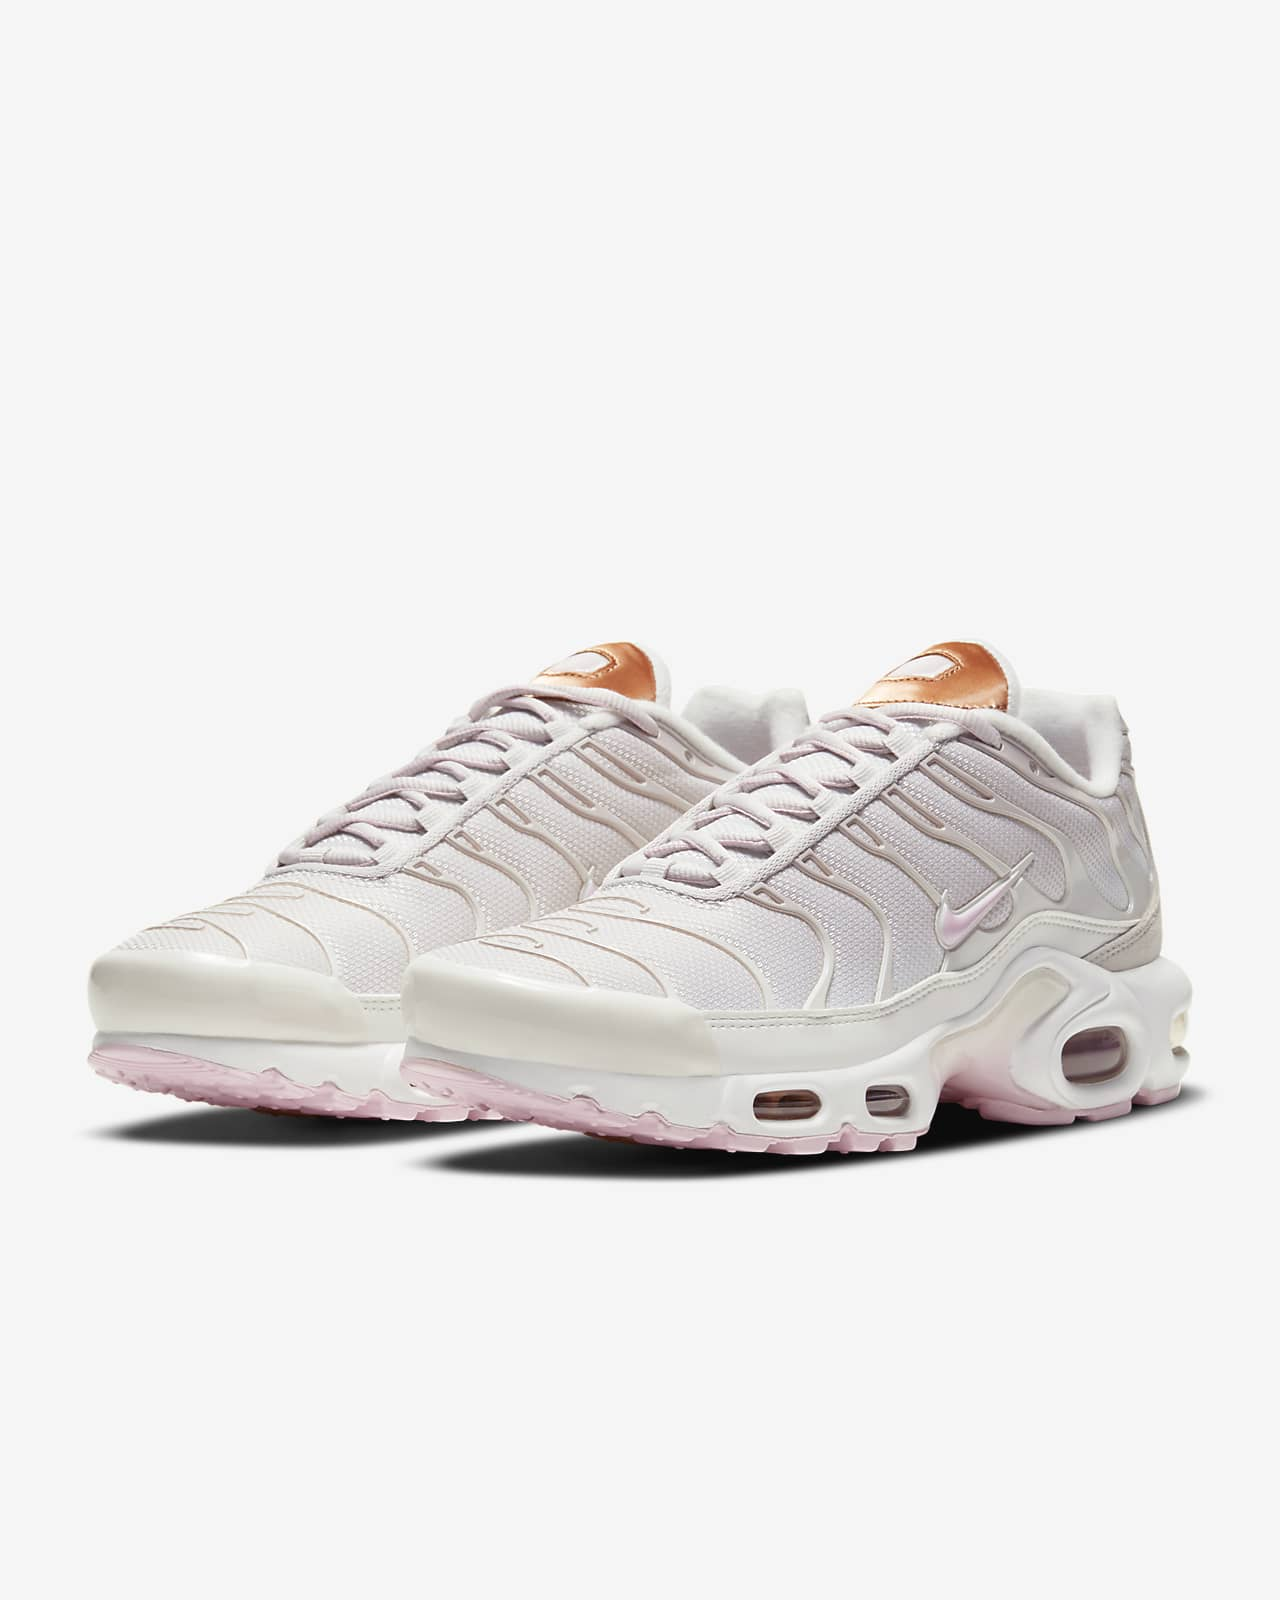 Vagabundo sobrina poco claro  Nike Air Max Plus Women's Shoe. Nike LU